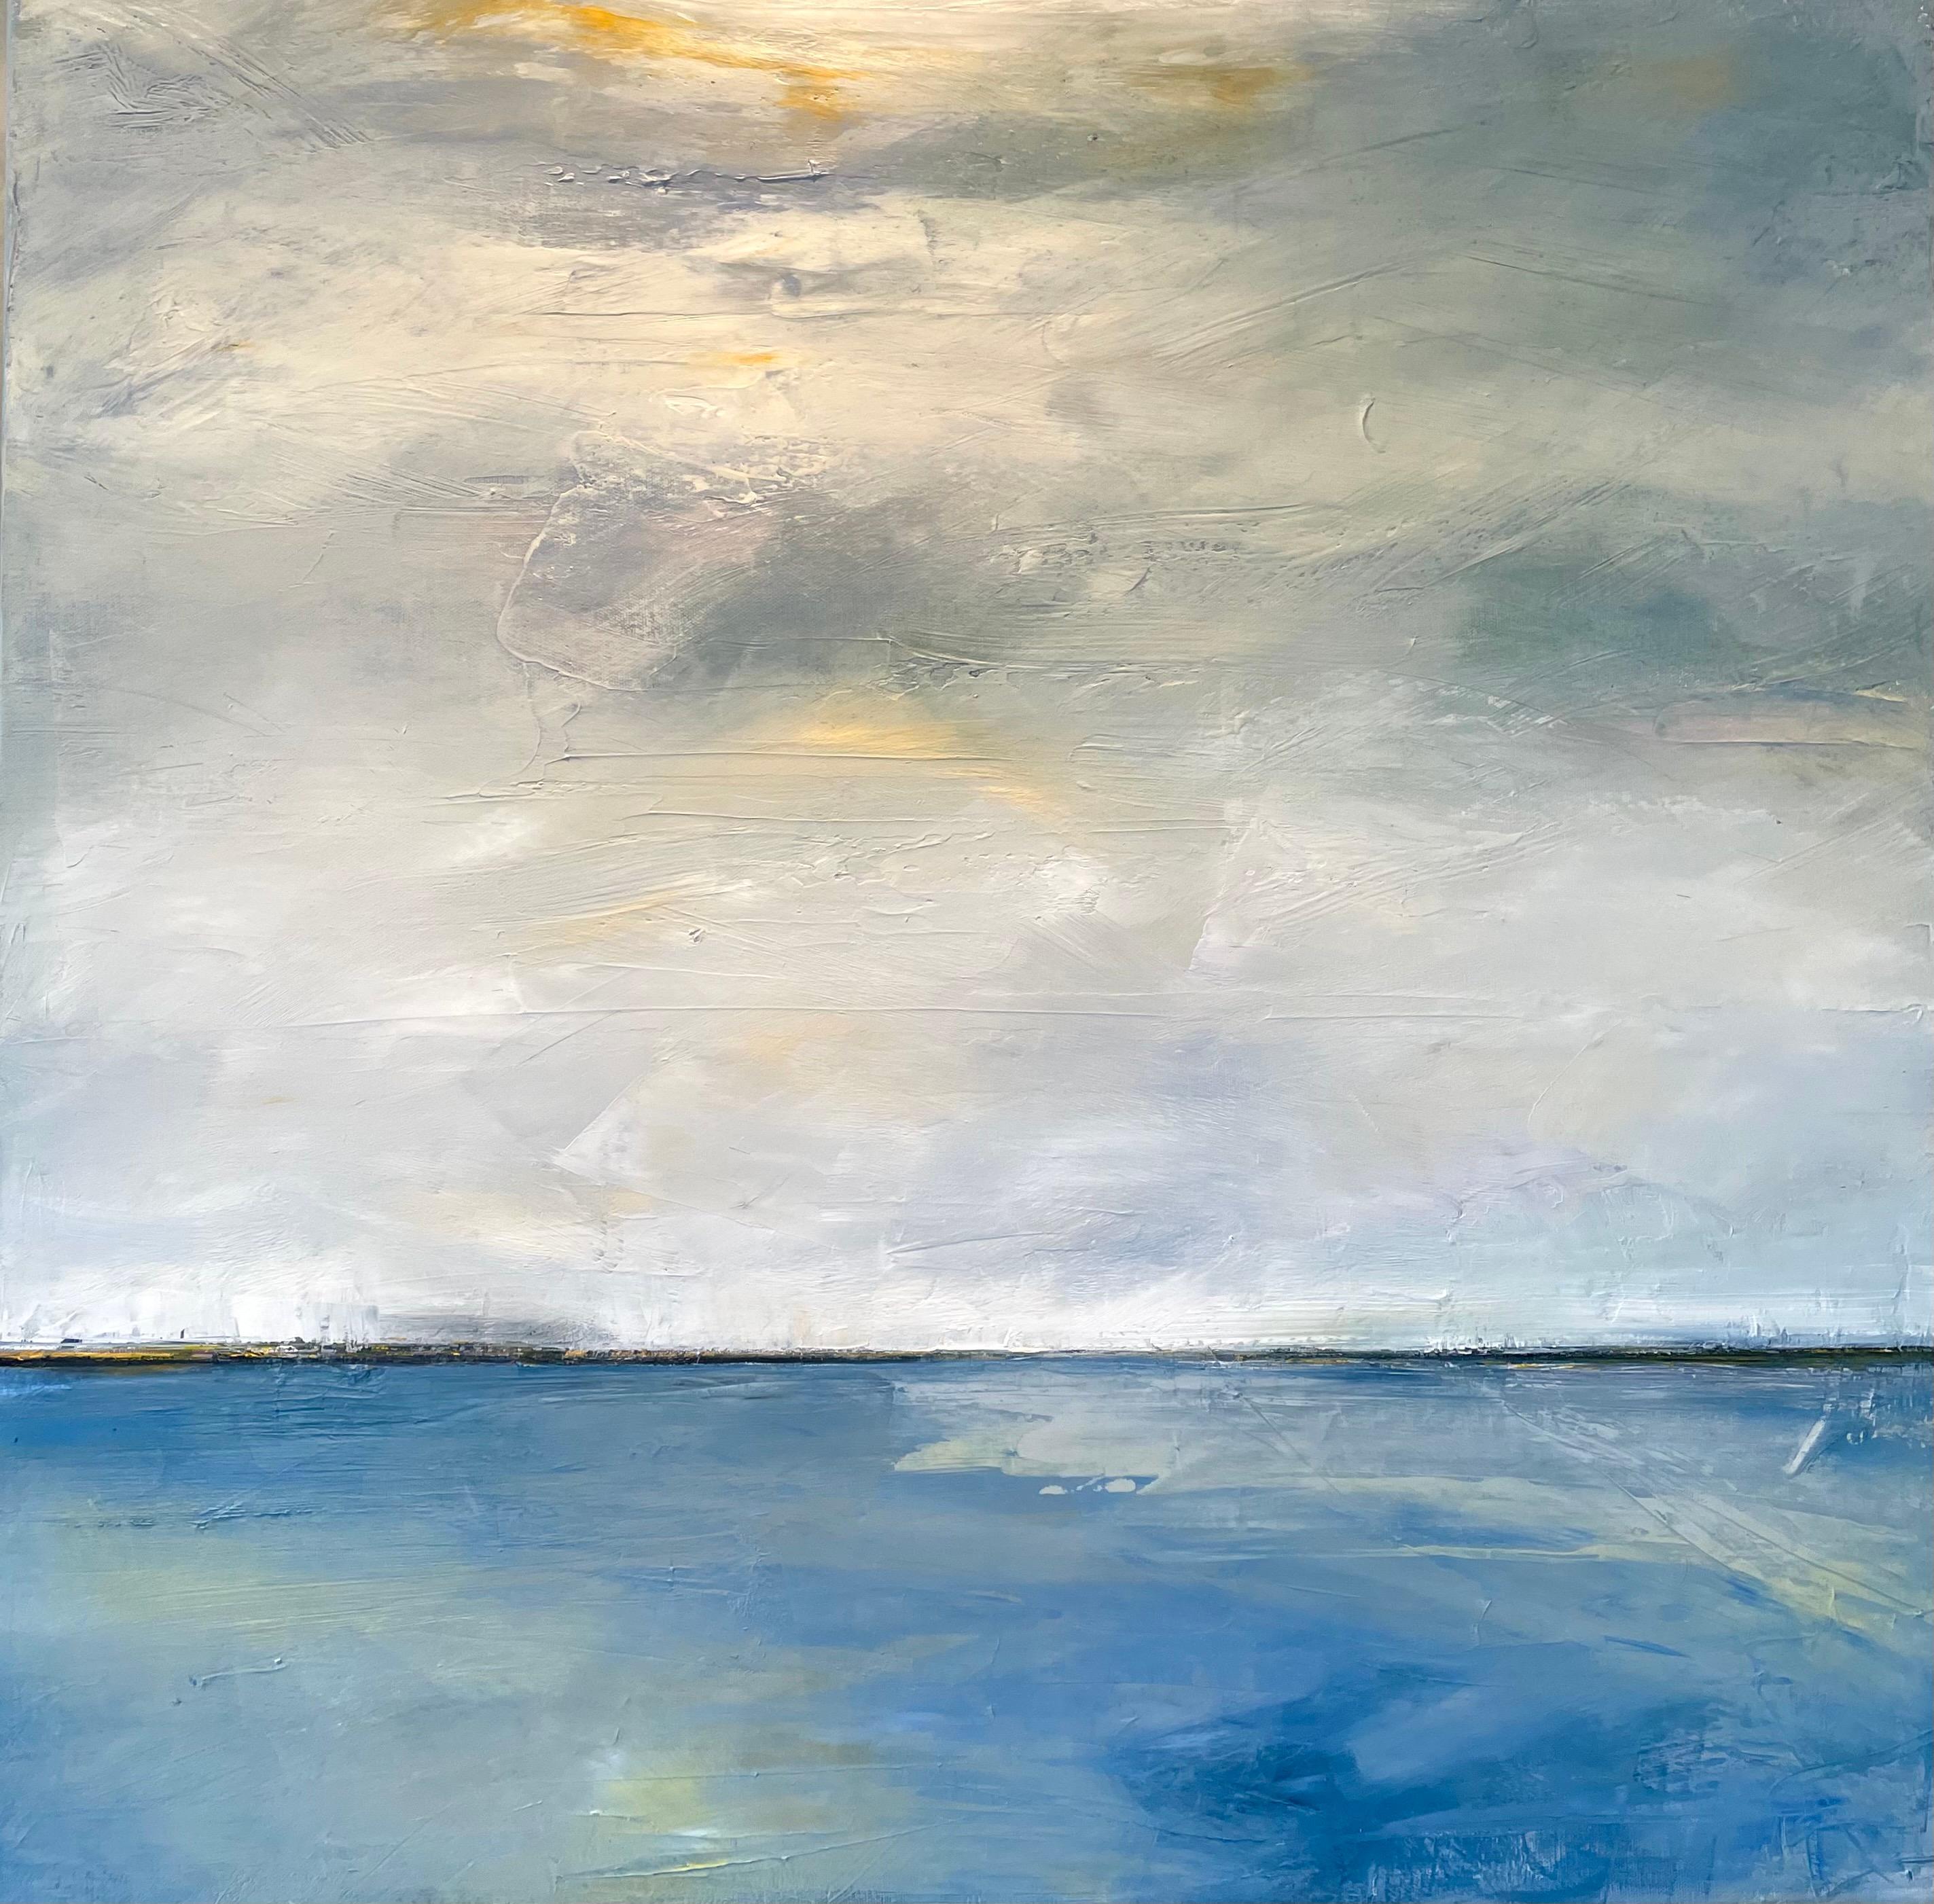 Crisp Air, Waterscape, Abstract Landscape, Oil, White, Blue, Sky